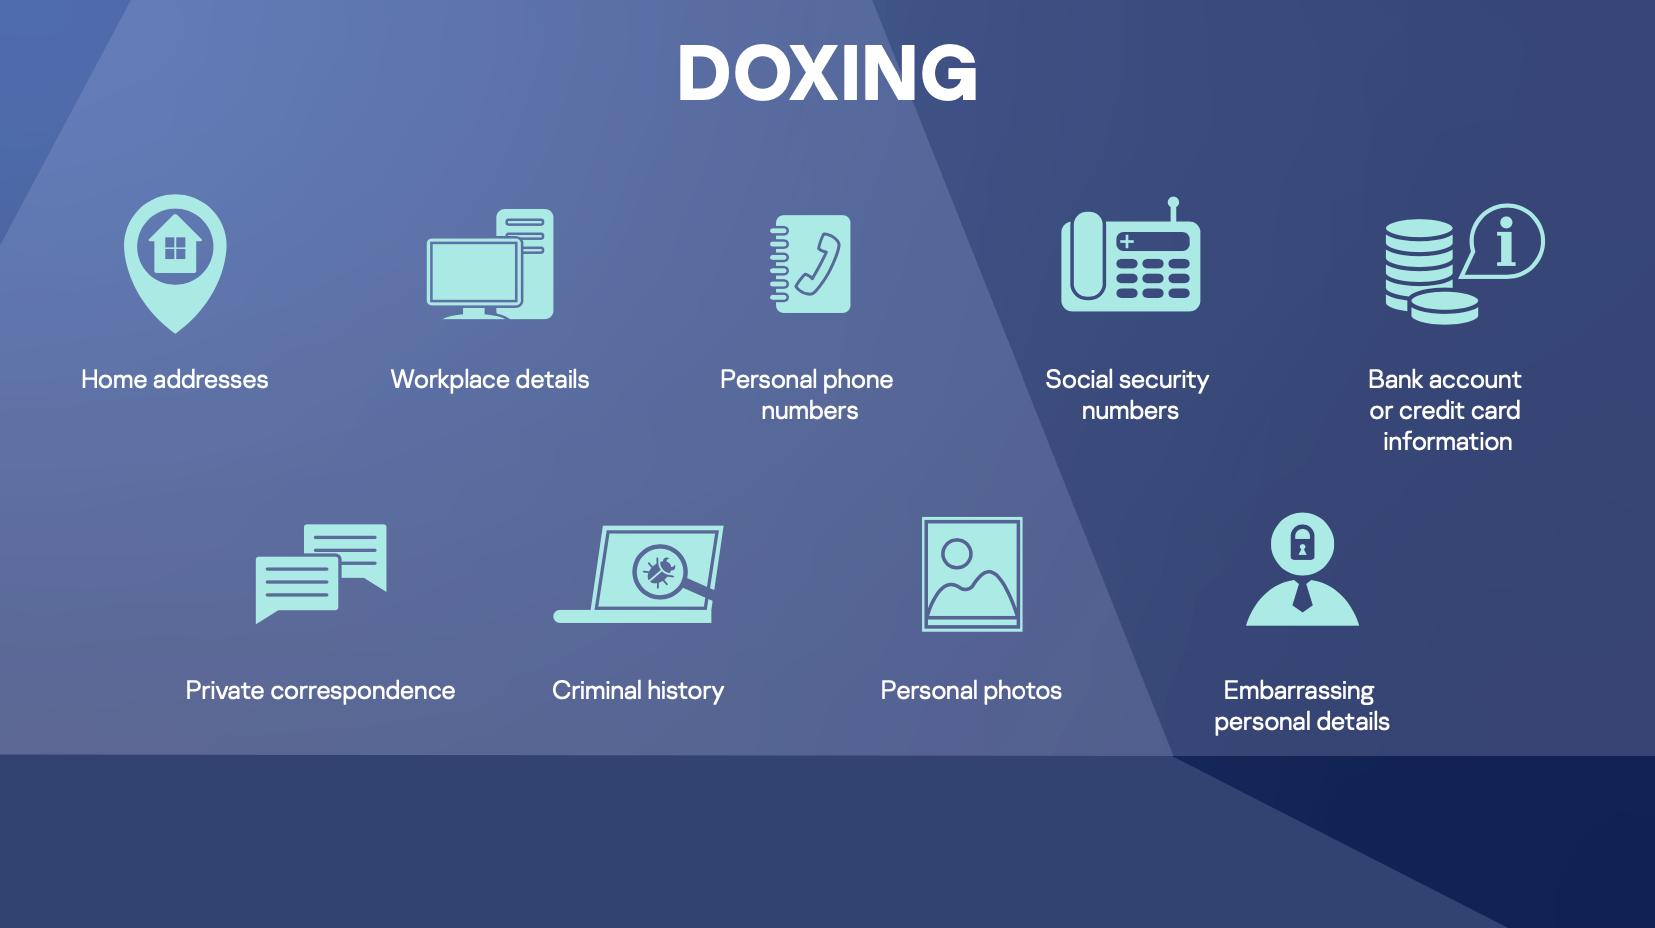 doxing-ul